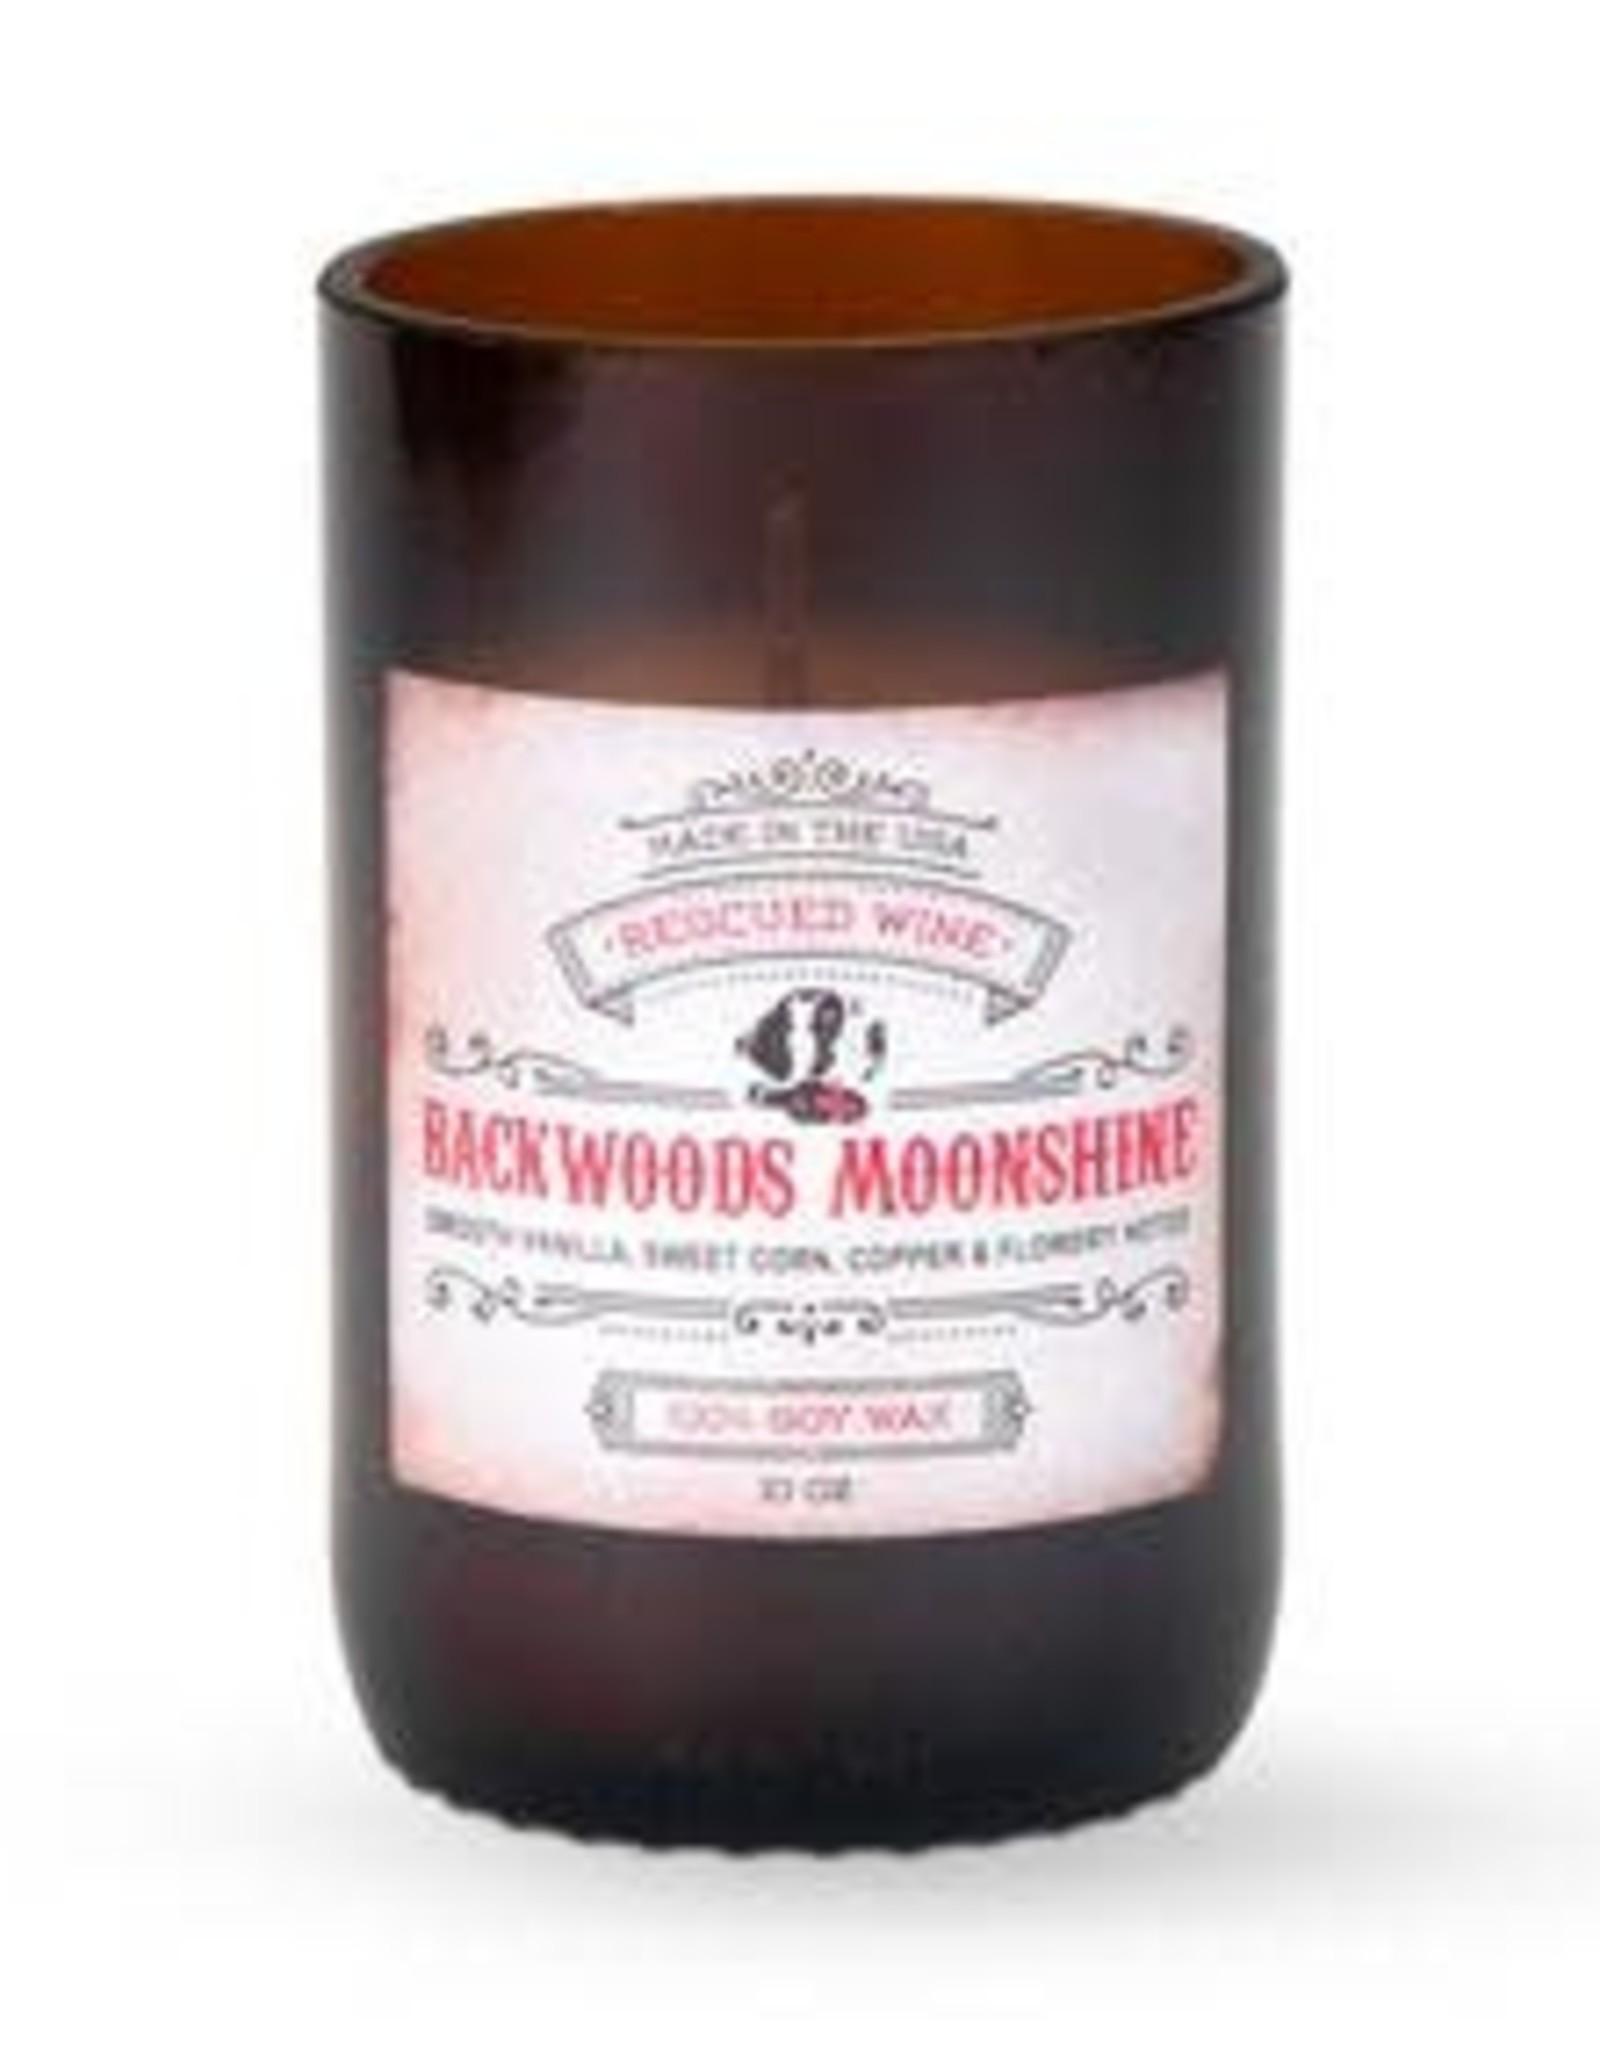 Rescue, Candles Backwoods Moonshine